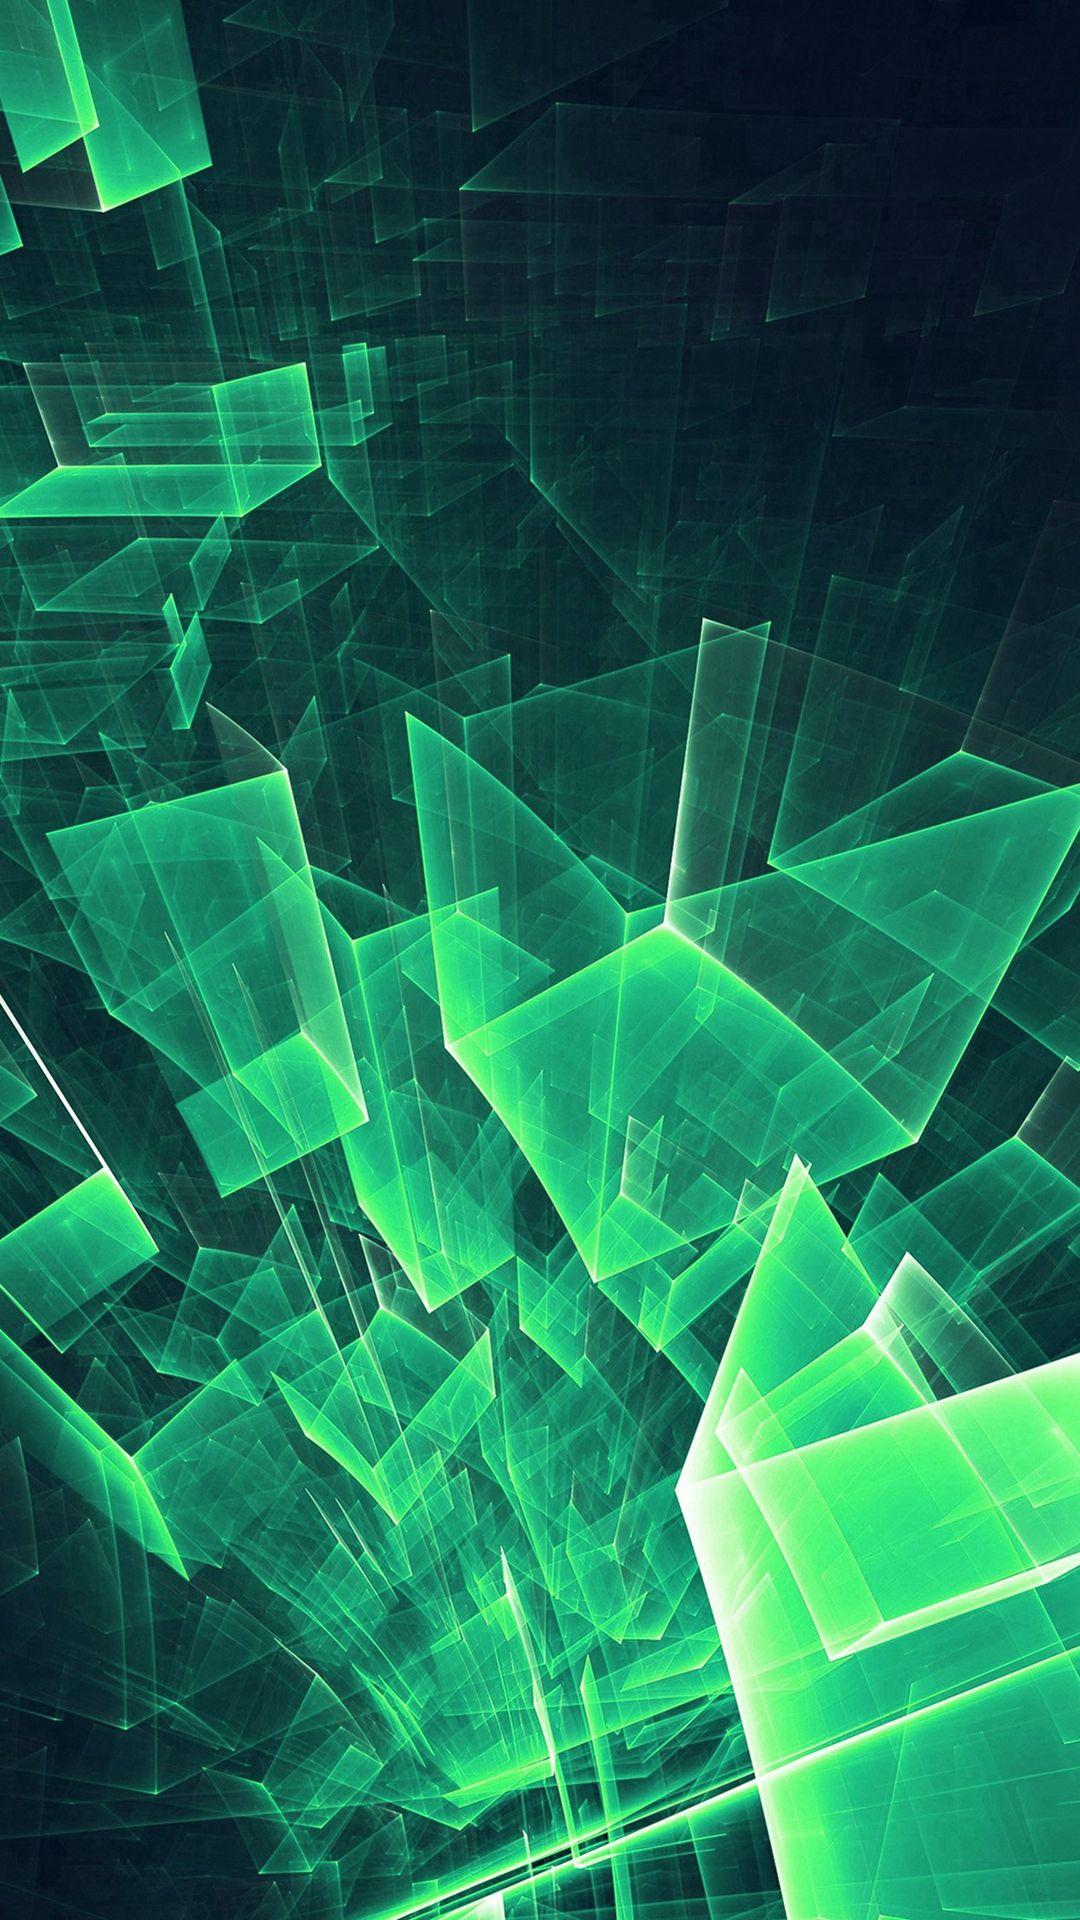 Wallpaper iphone green - Abstract Blue Green Cube Pattern Iphone 7 Wallpaper